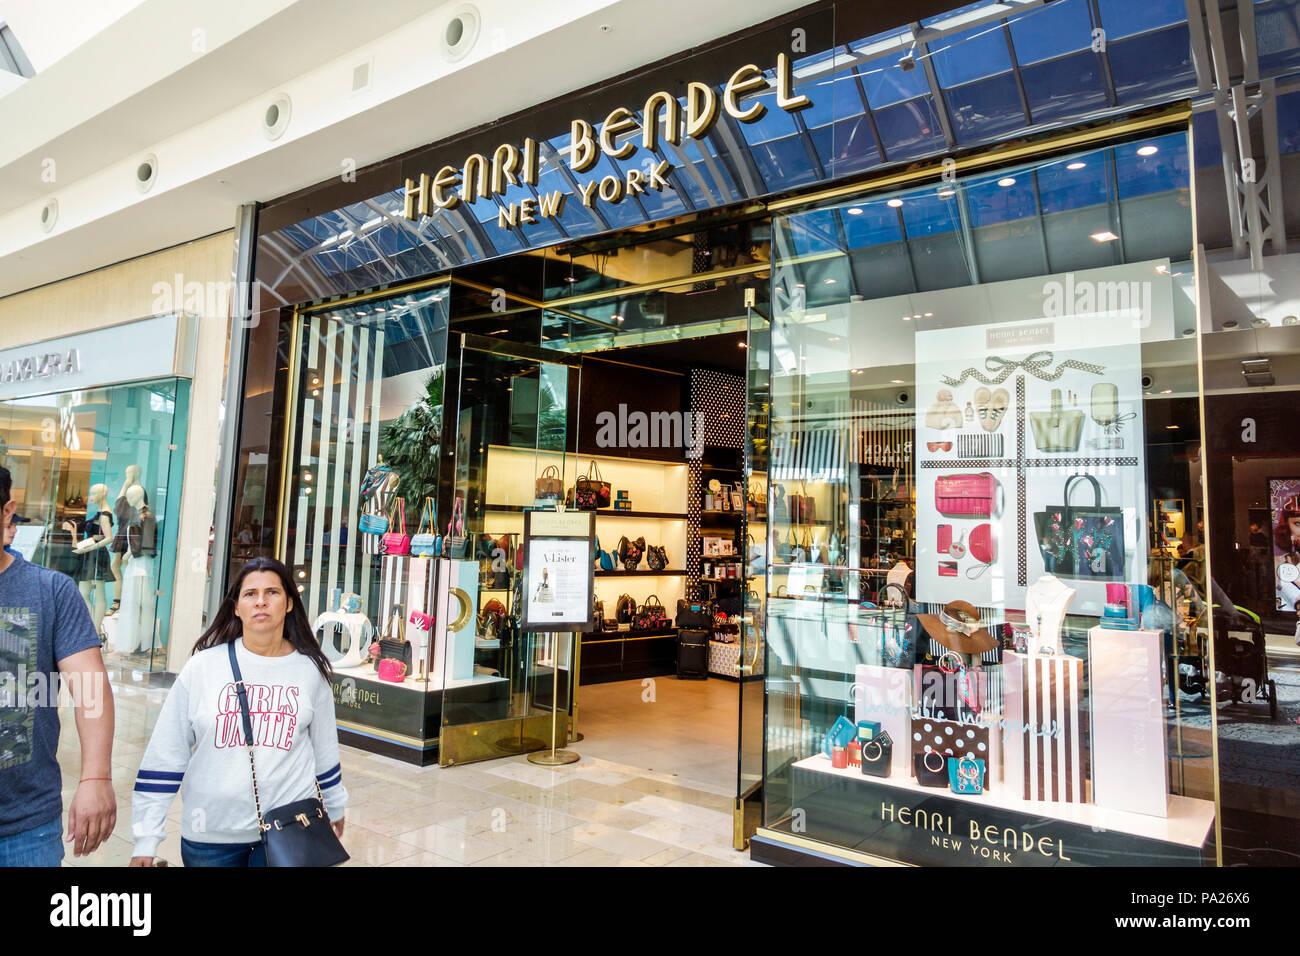 Orlando Florida The Mall at Millenia shopping Henri Bendel designer boutique handbags upscale women's specialty store entrance window display woman wa - Stock Image